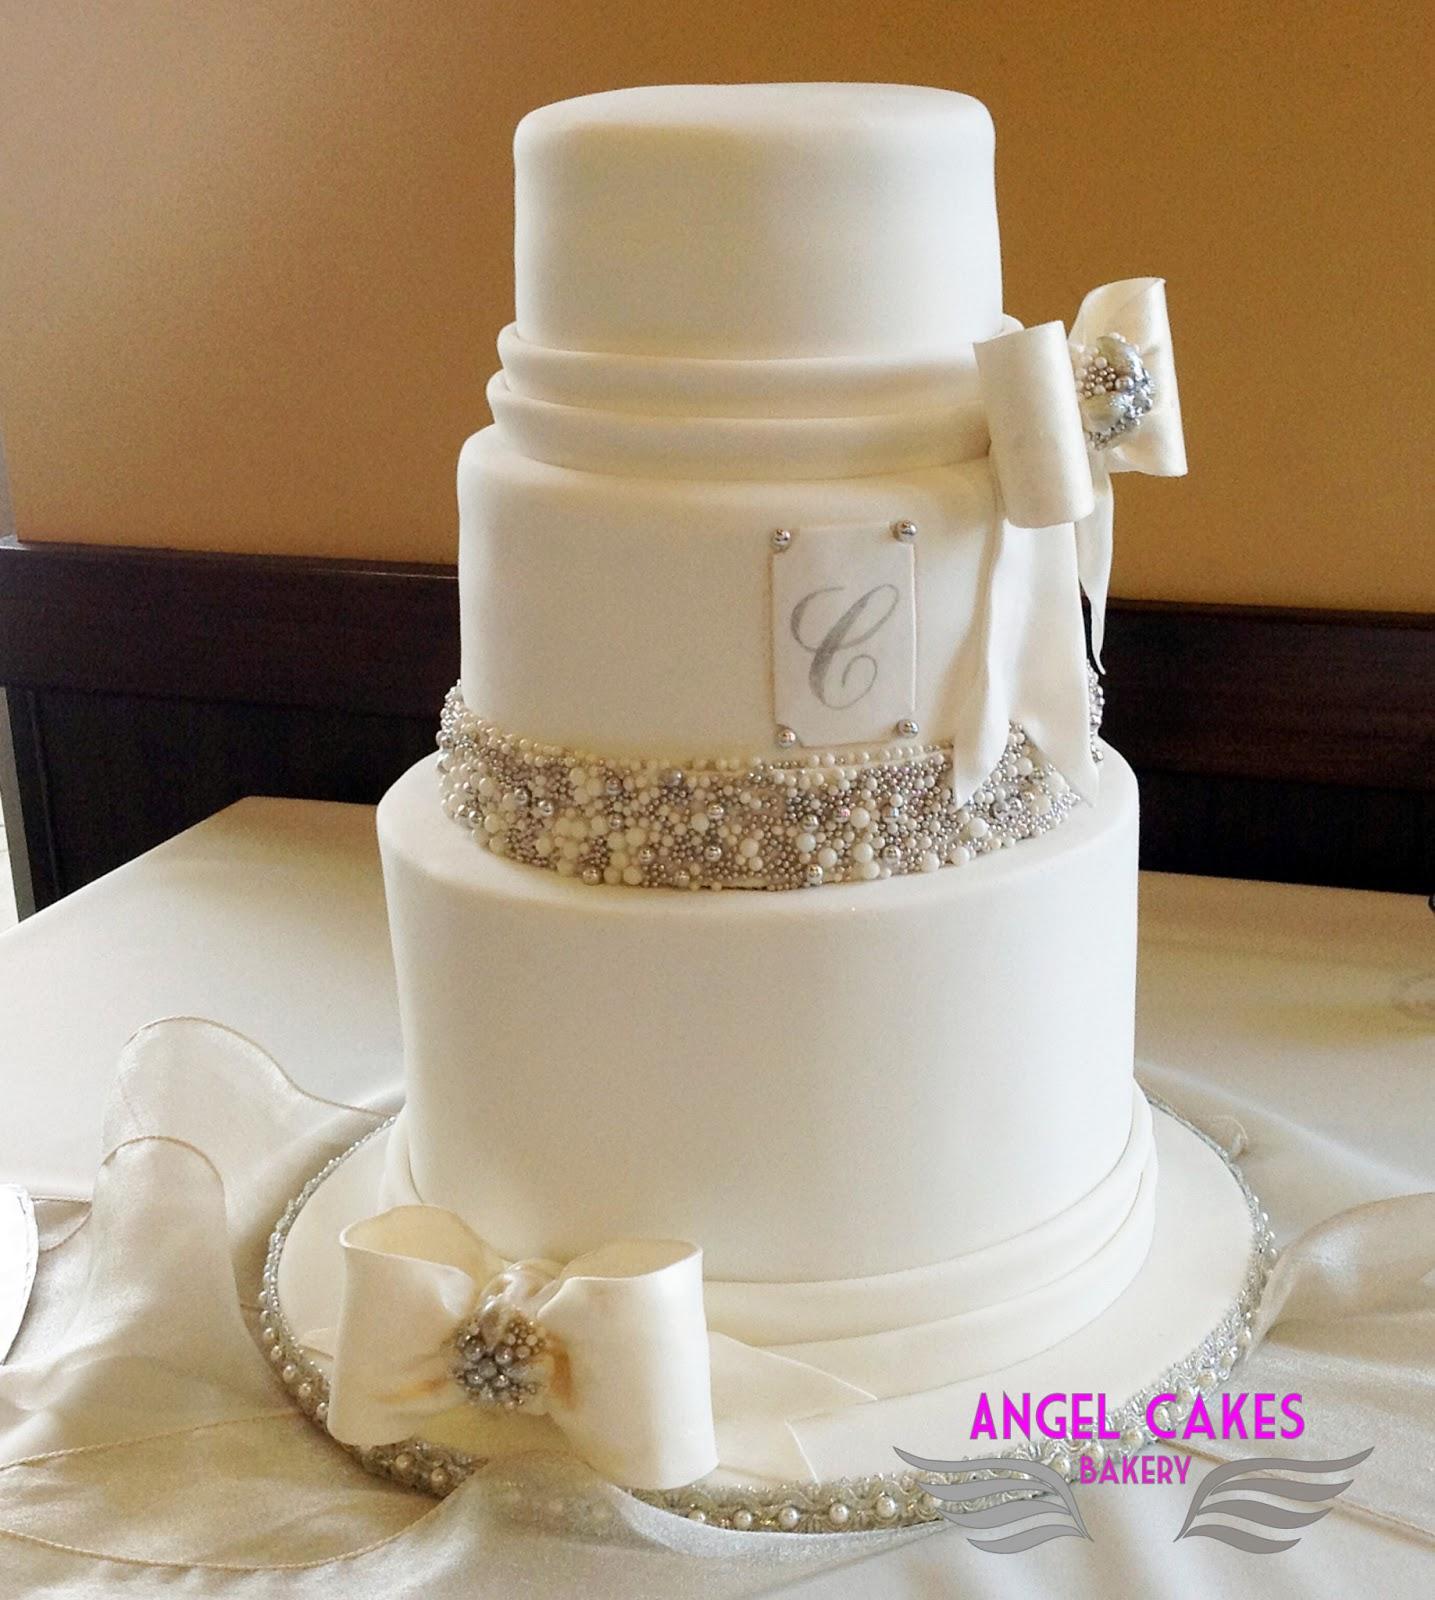 Angel Cakes Bakery Bling Bows Wedding Cake